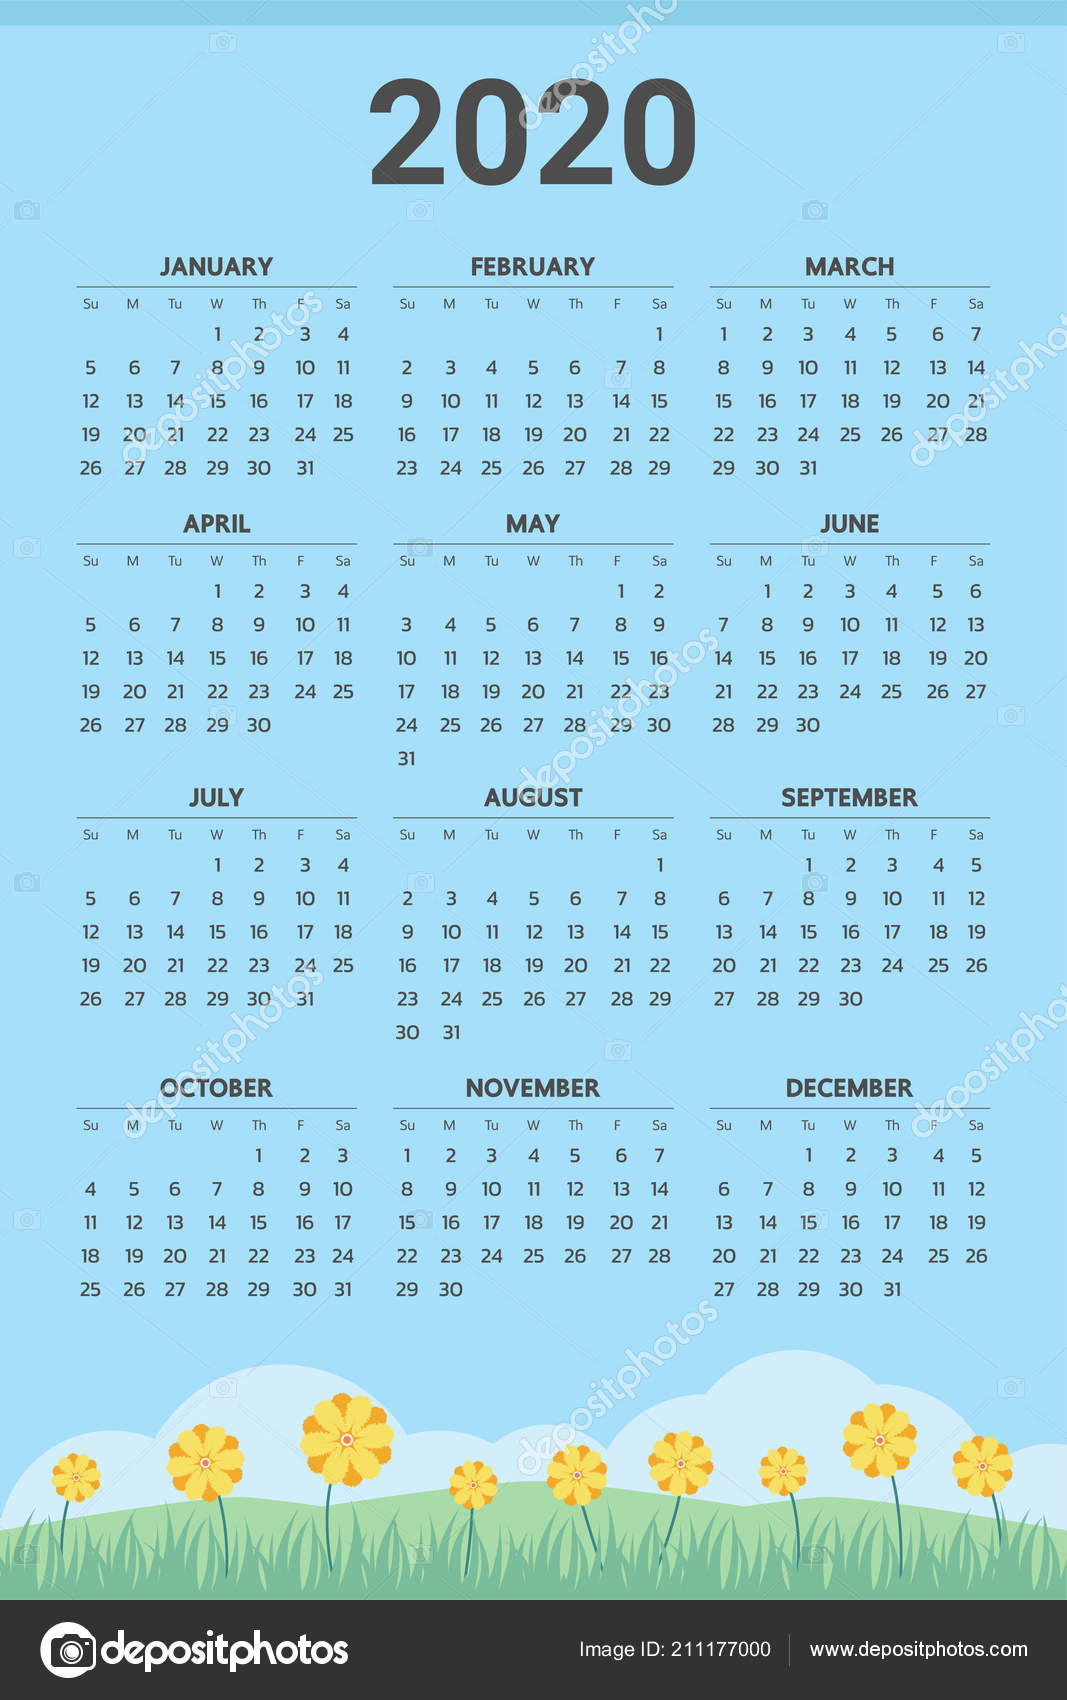 2020 Calendar Spring Theme Vector — Stock Vector © Andramin #211177000 with Football Theme Blank Dates Calendar